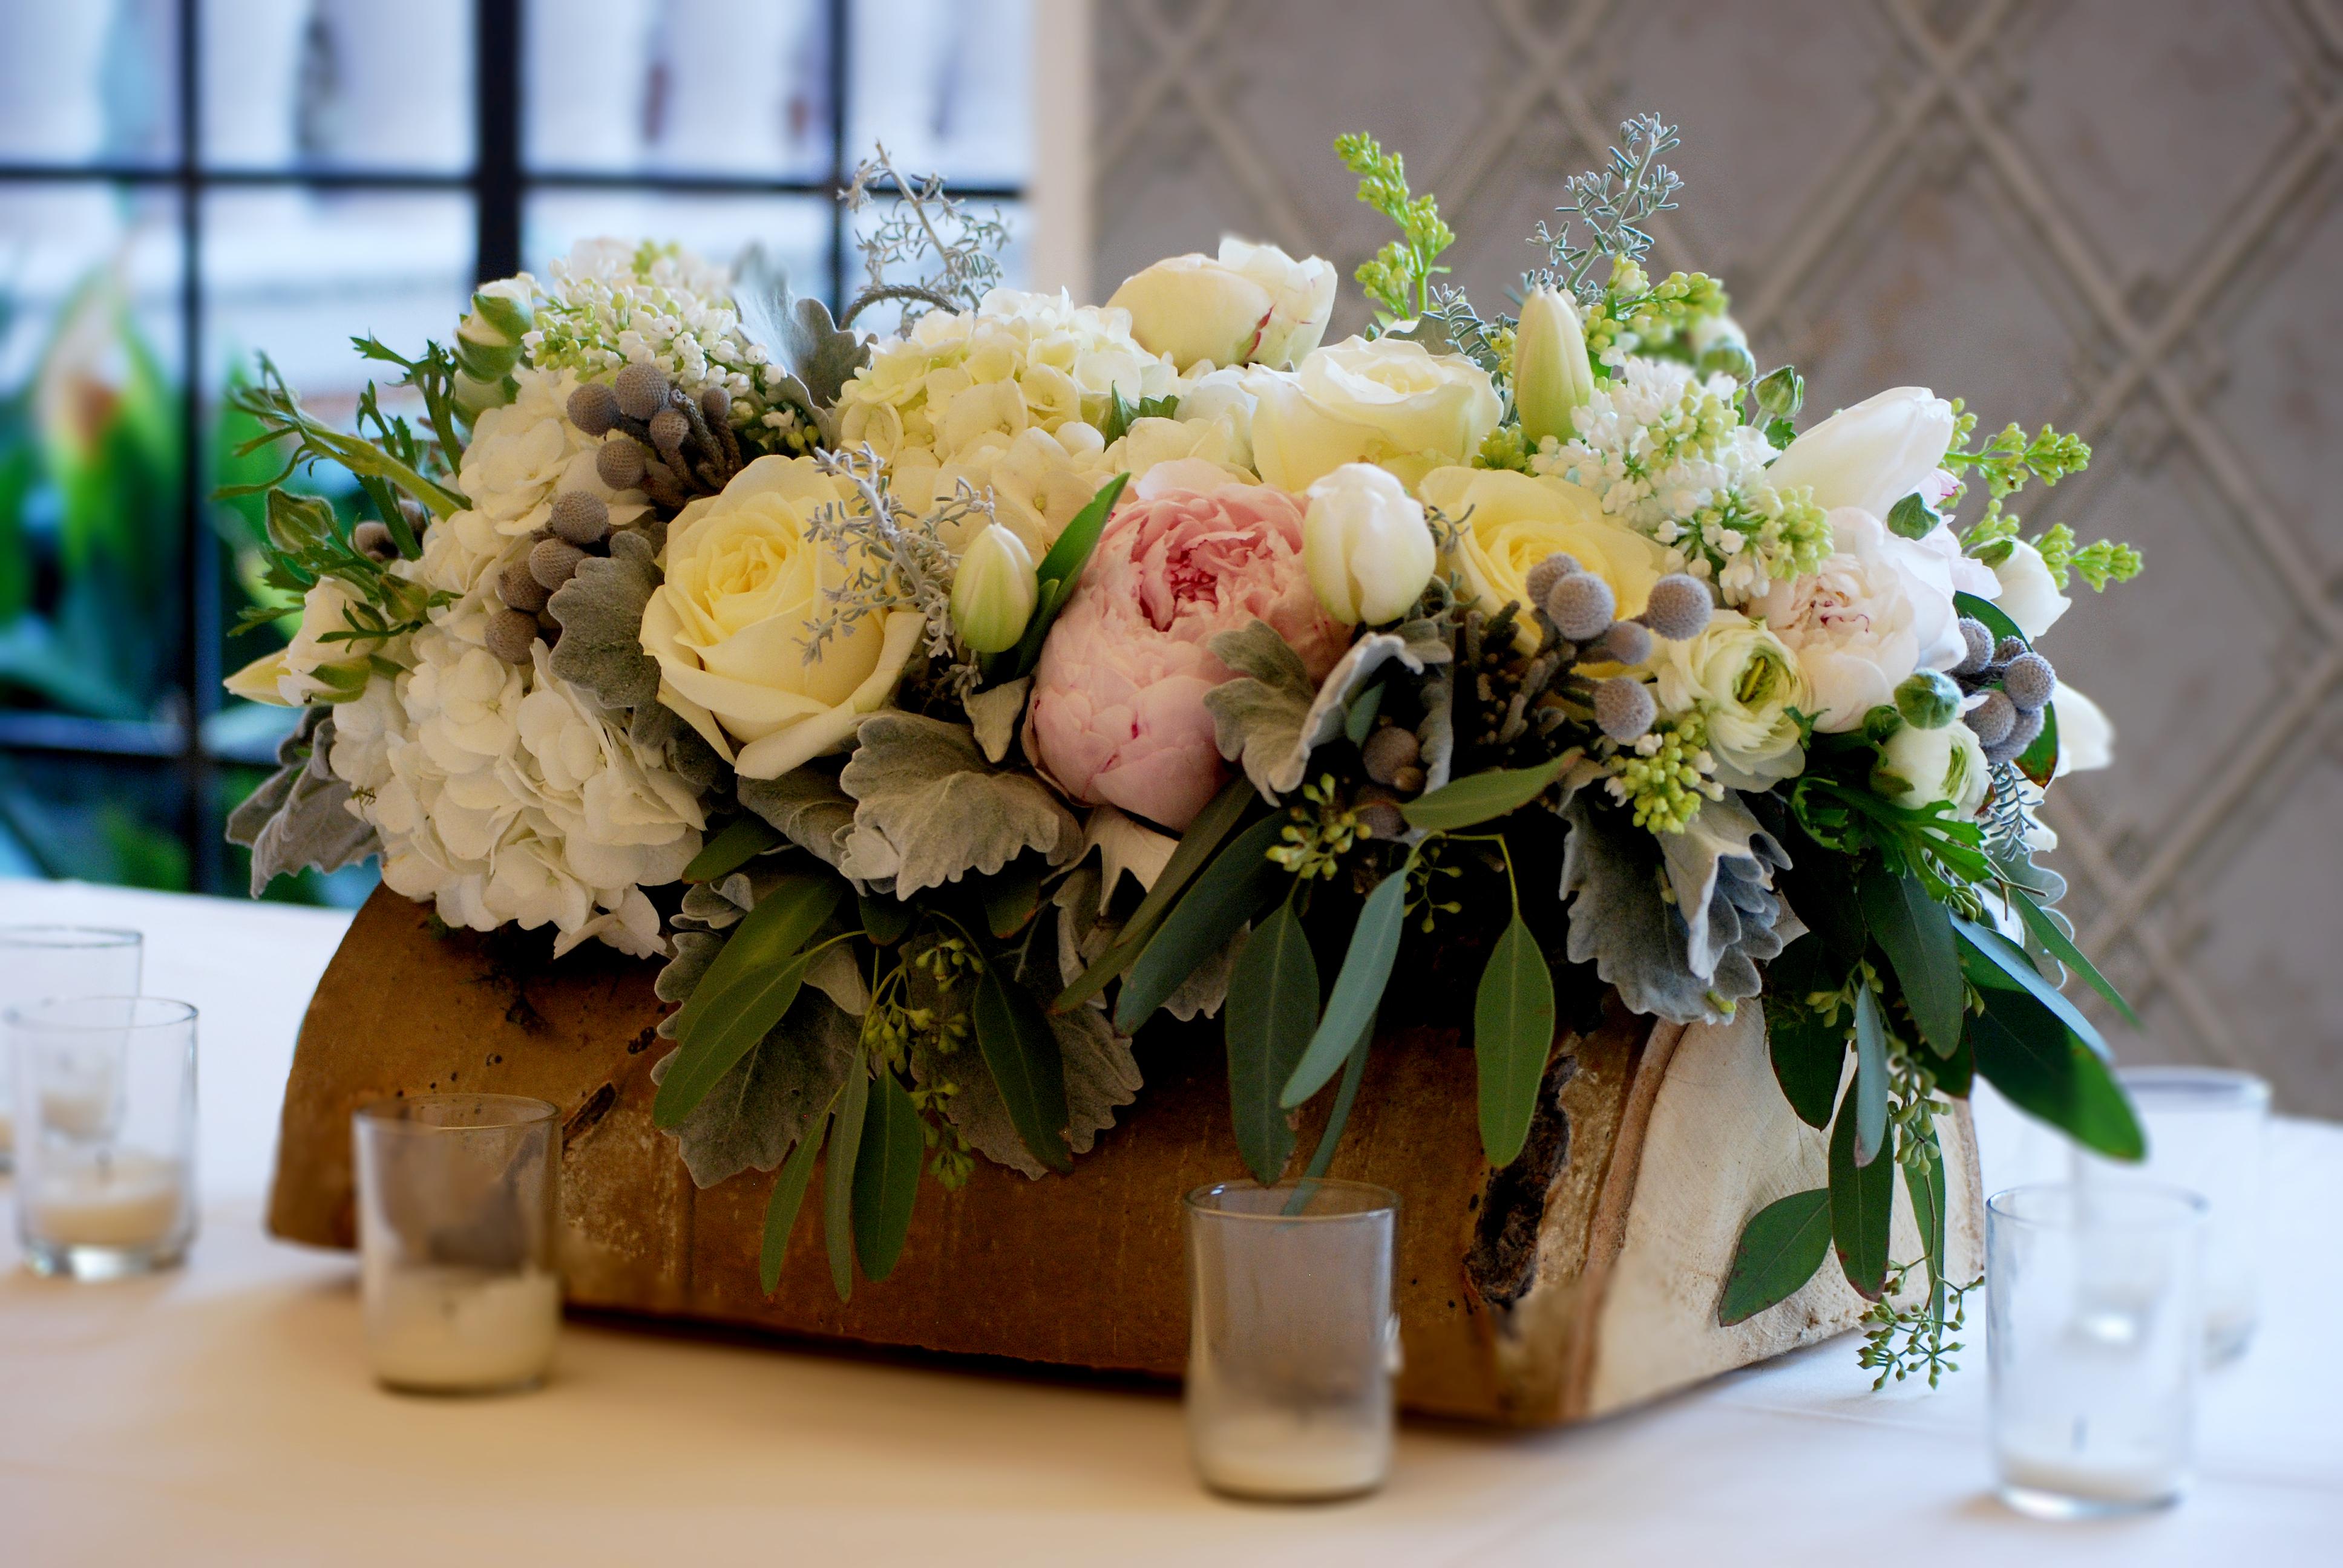 Cebolla Fine Flowers Aspen Log Arrangement Rustic Arrangements January Wedding The